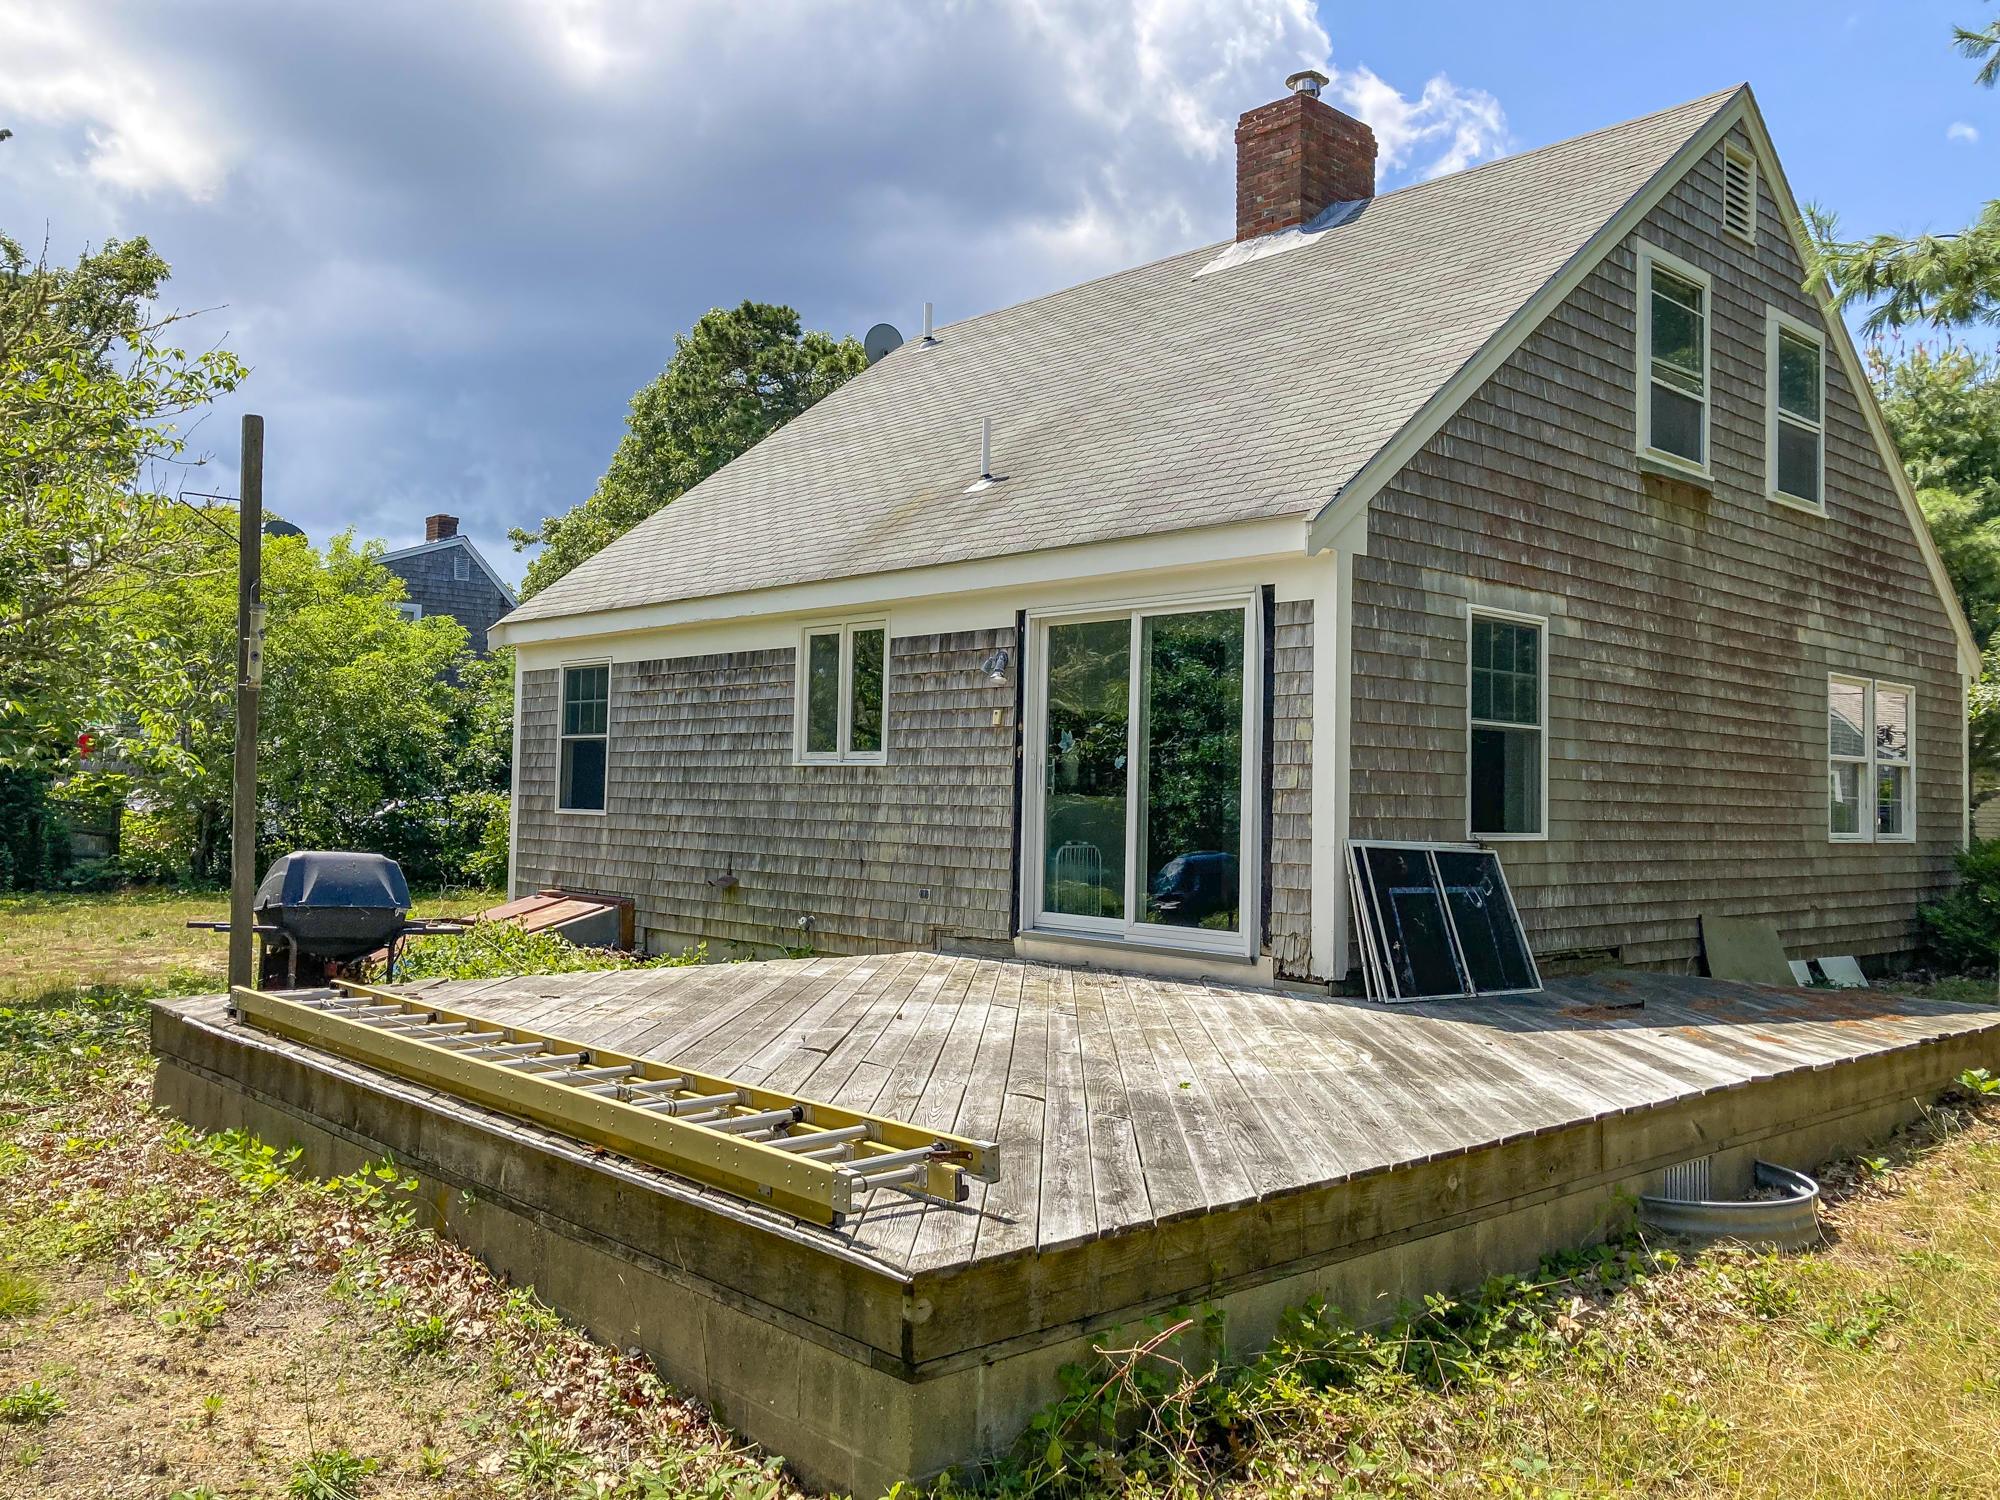 70 West Pond Road, Chatham, MA  02633 - slide 2